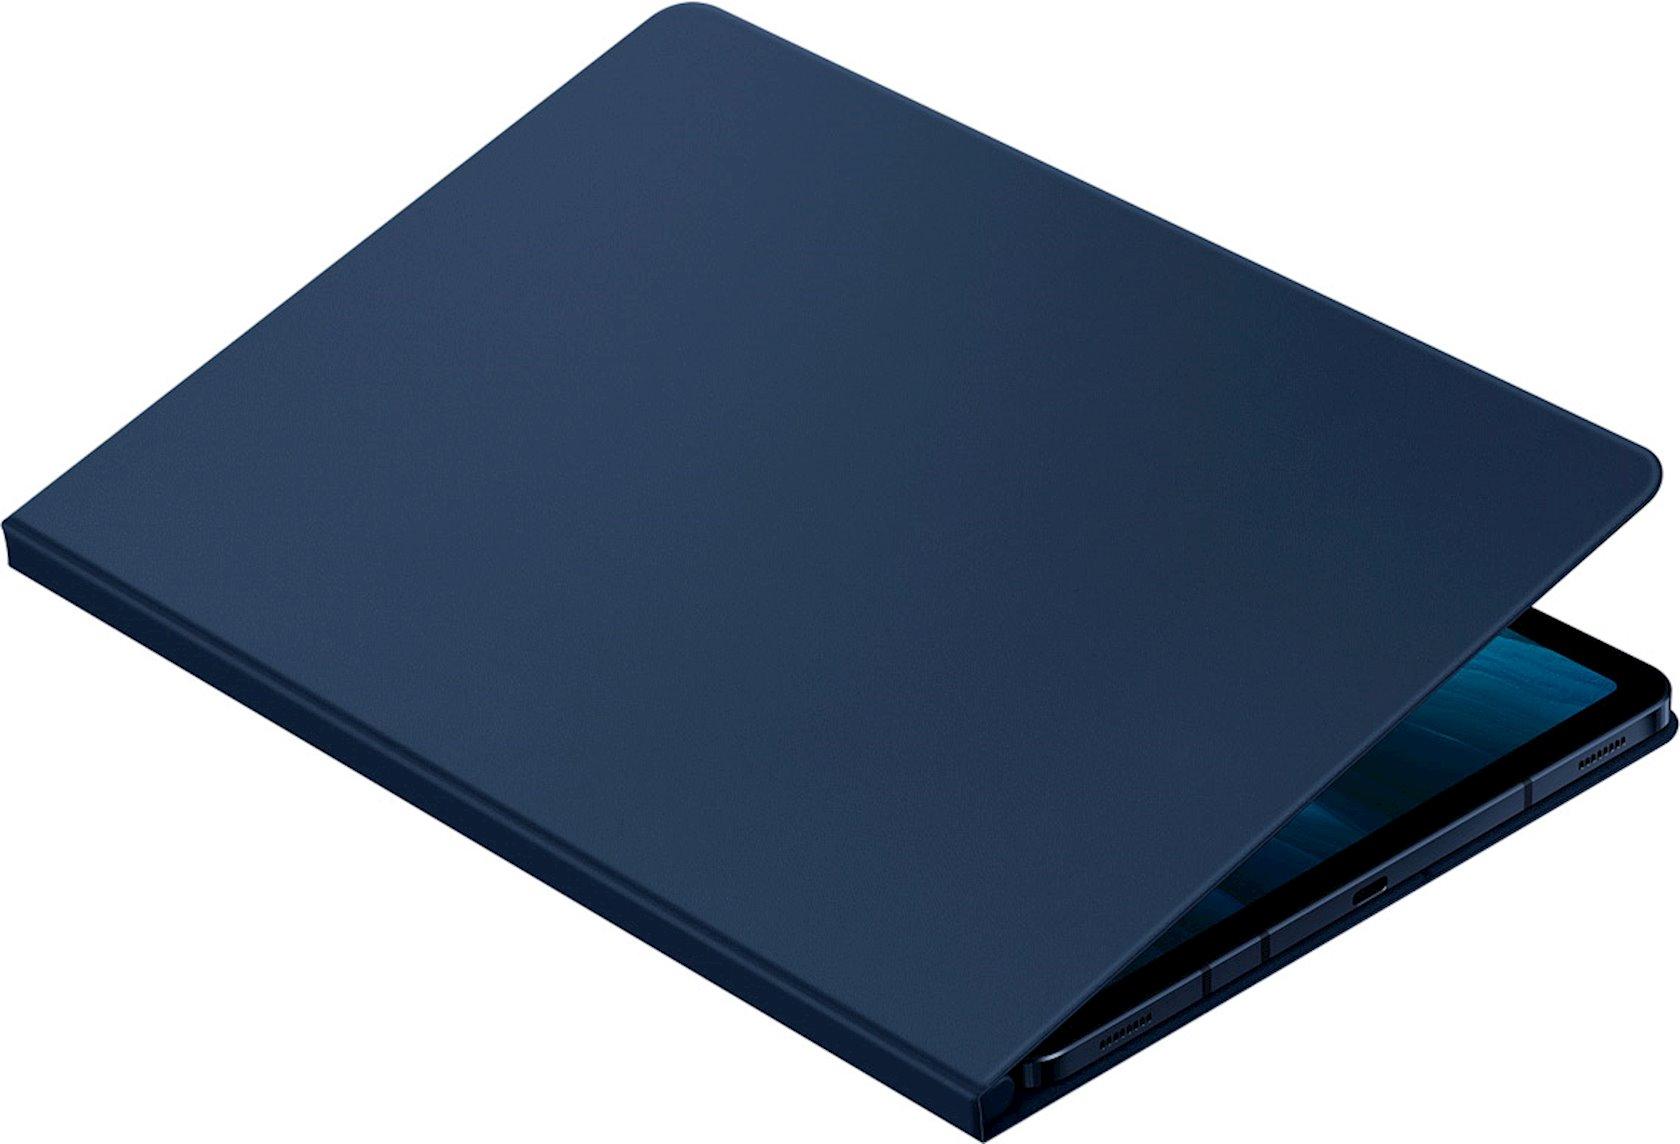 Çexol Samsung Book Cover Tab S7 (EF-BT870PNEGRU)